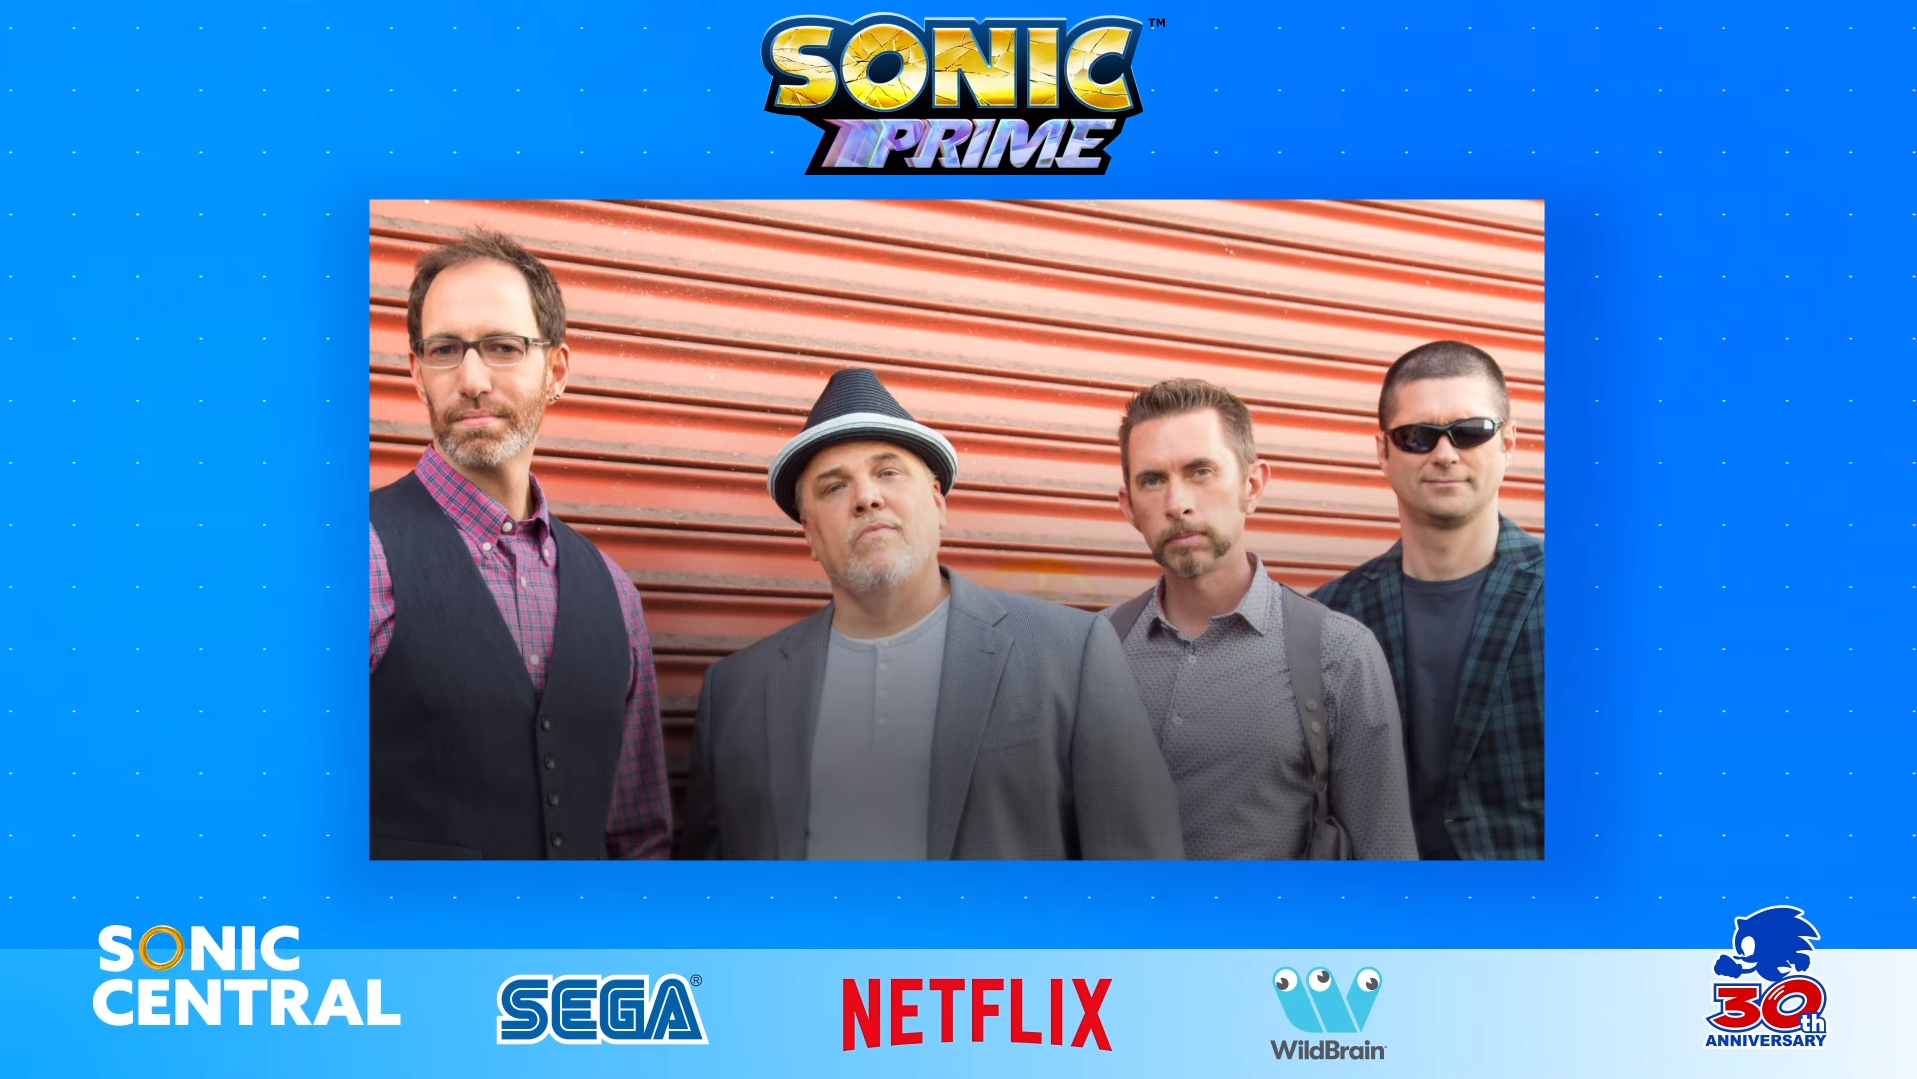 Sonic Central Netflix Show